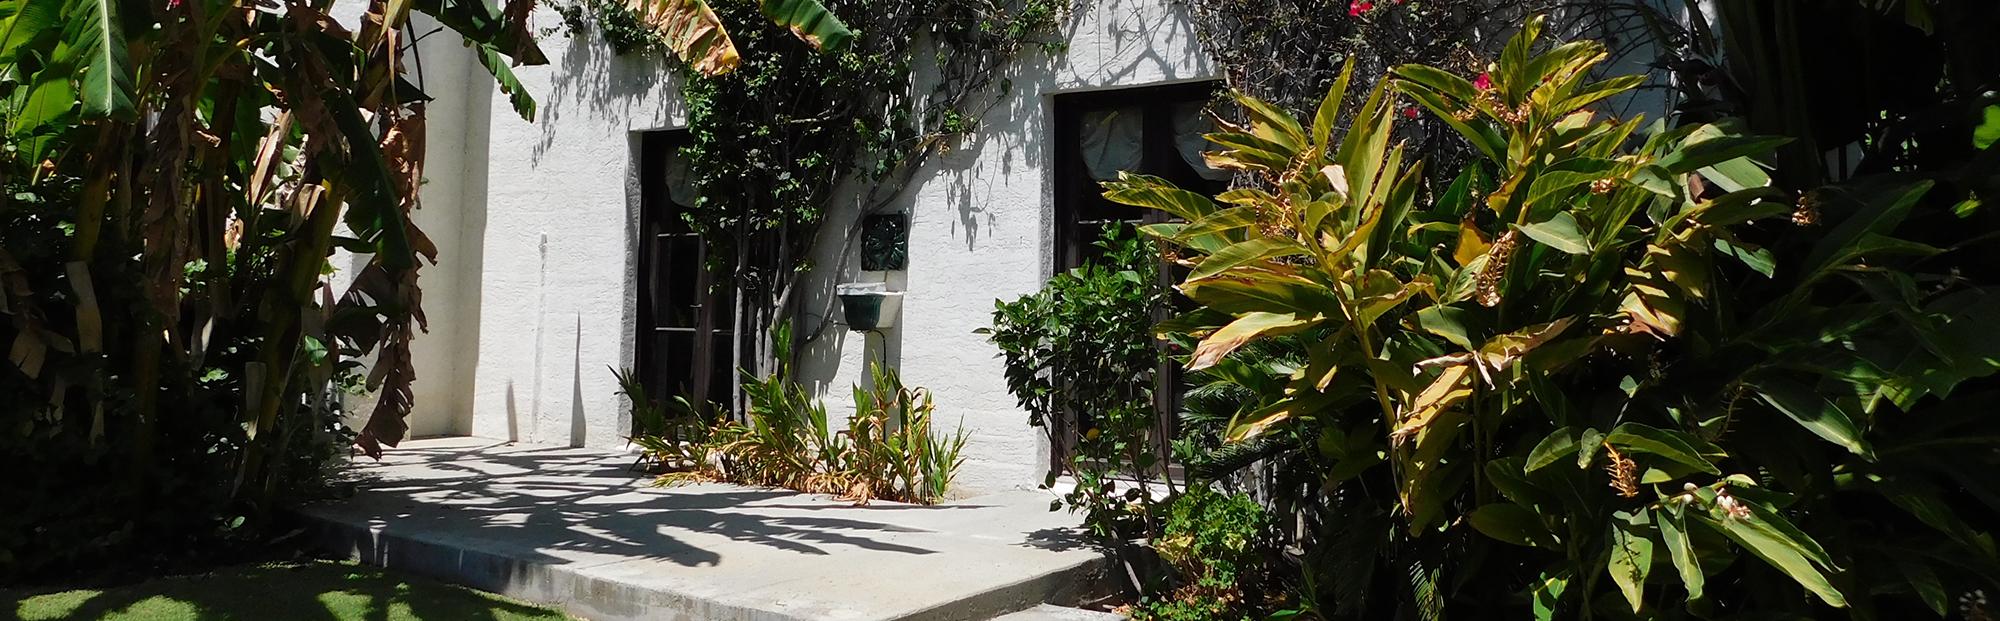 iGavel Interiors: Hacienda Heights, CA - A Spanish Colonial Estate